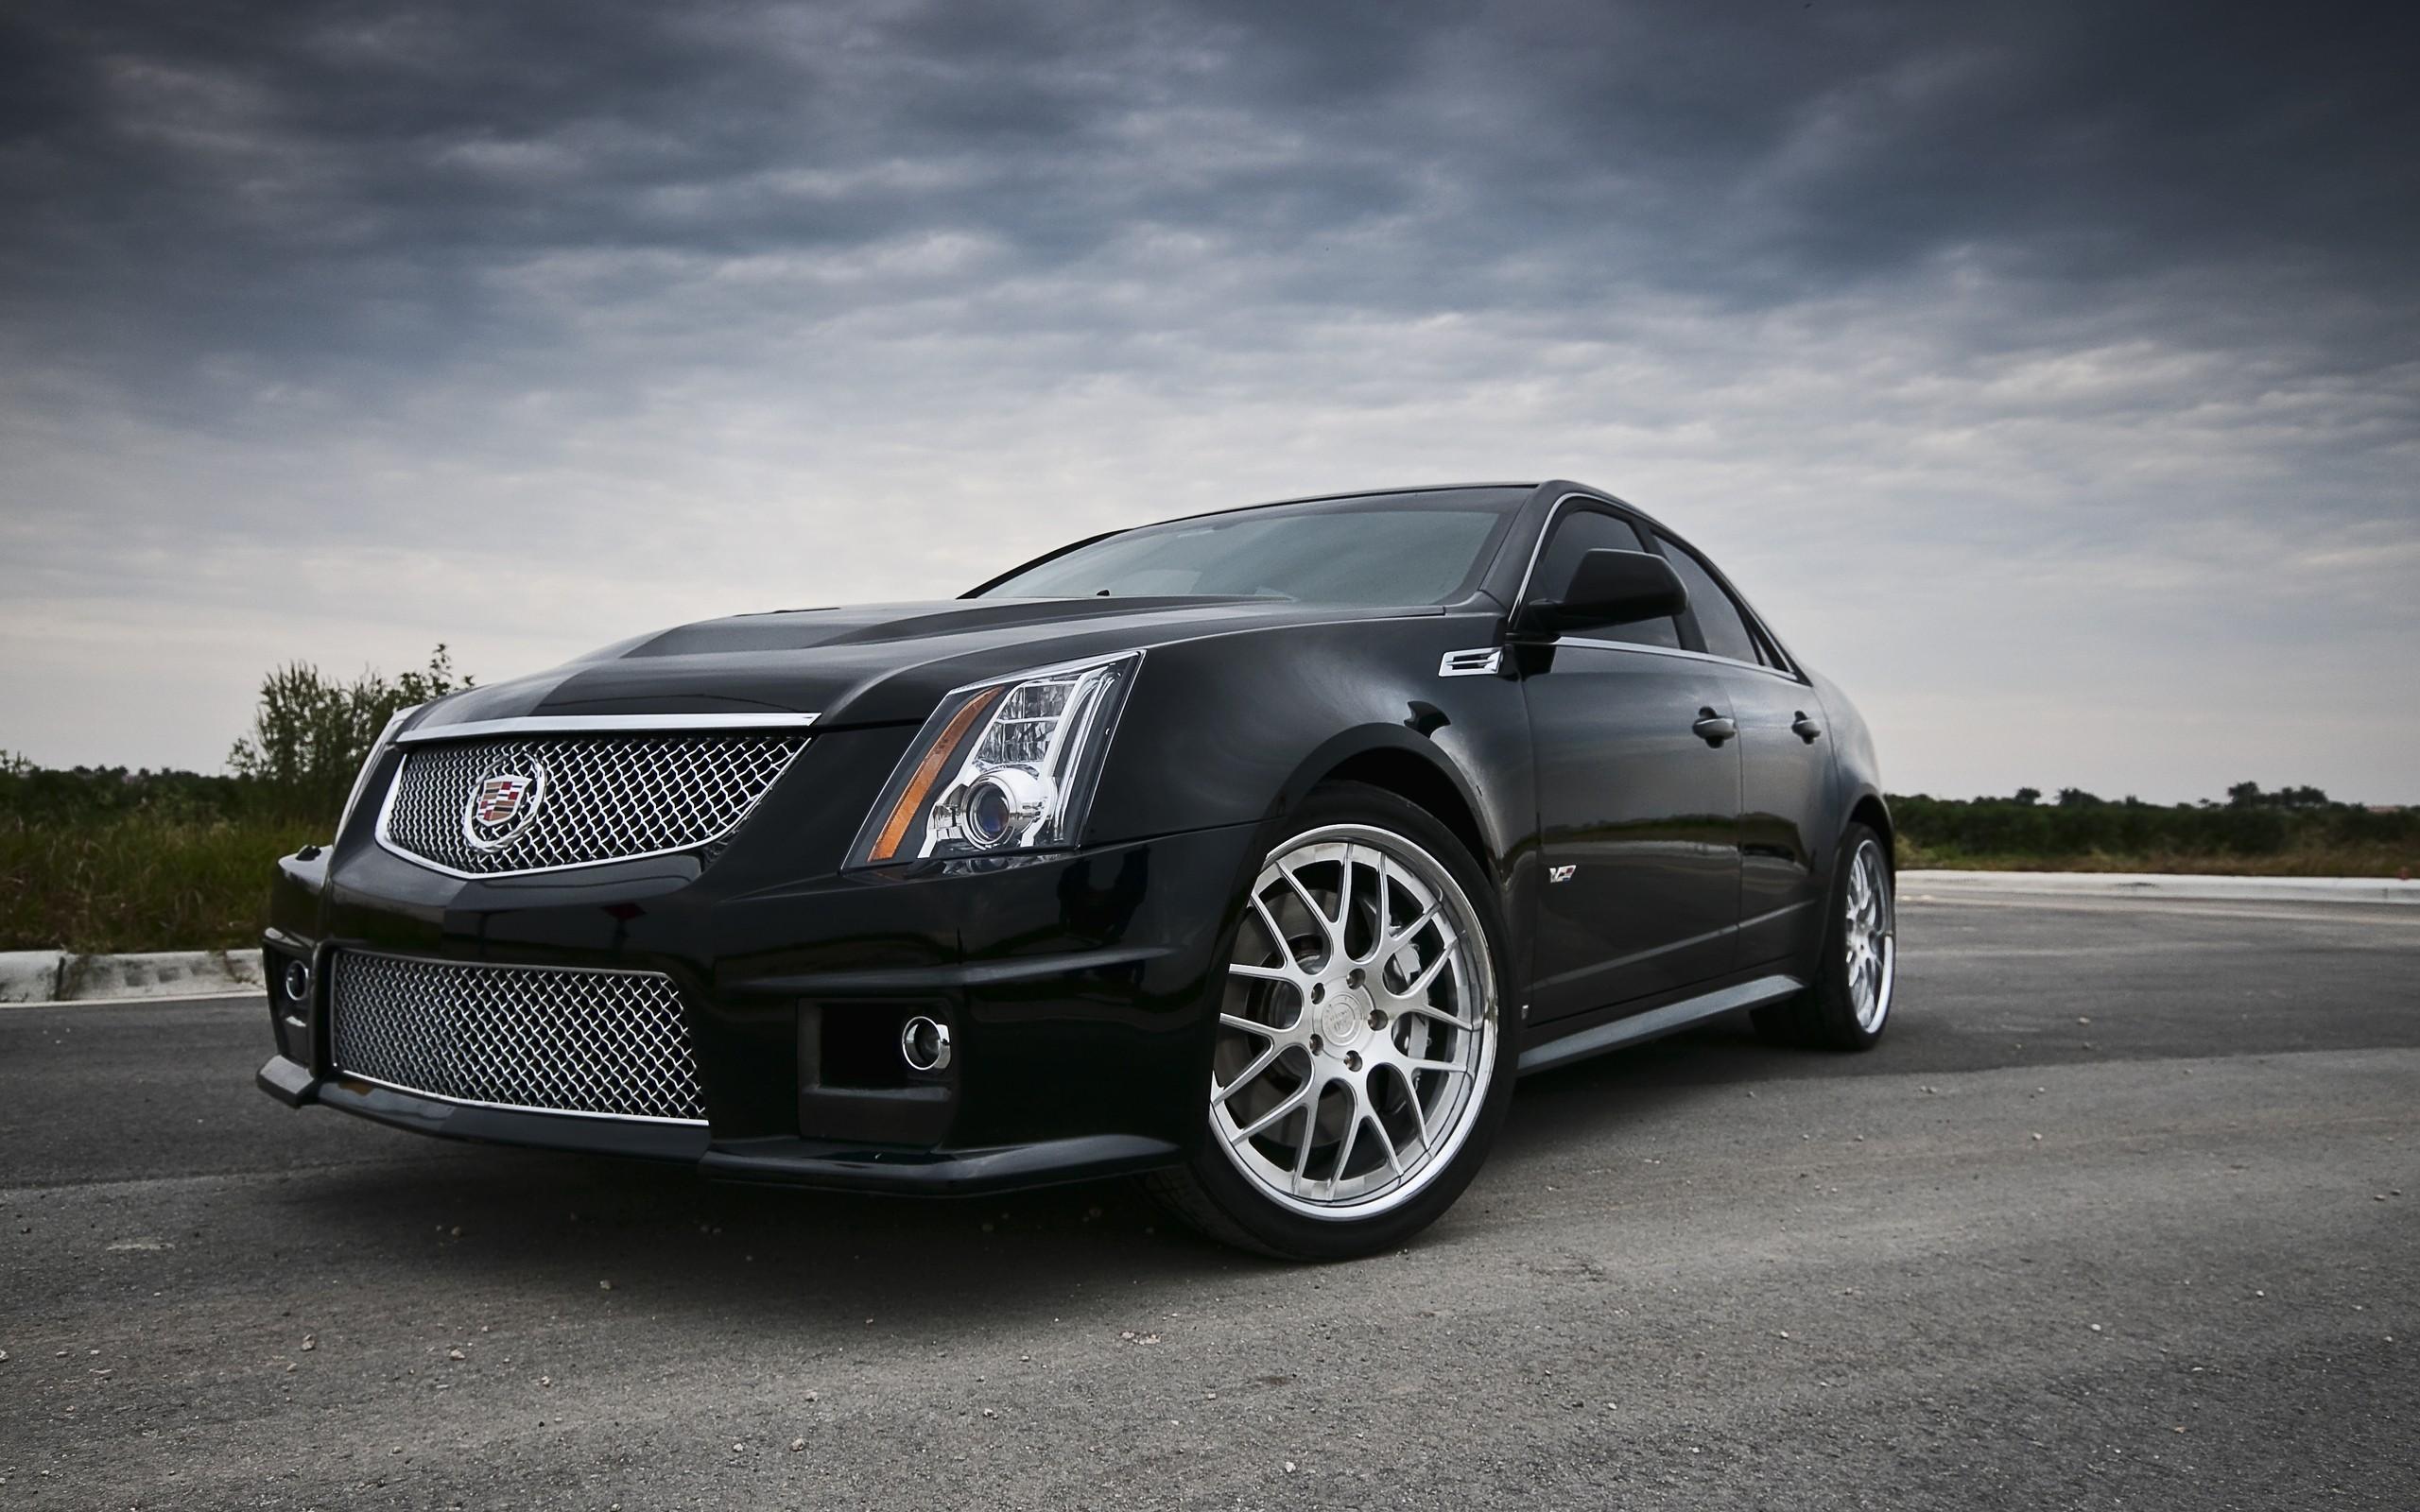 Black Luxury Vehicles: Black Cars Vehicles Supercars Tuning Wheels Racing Sports